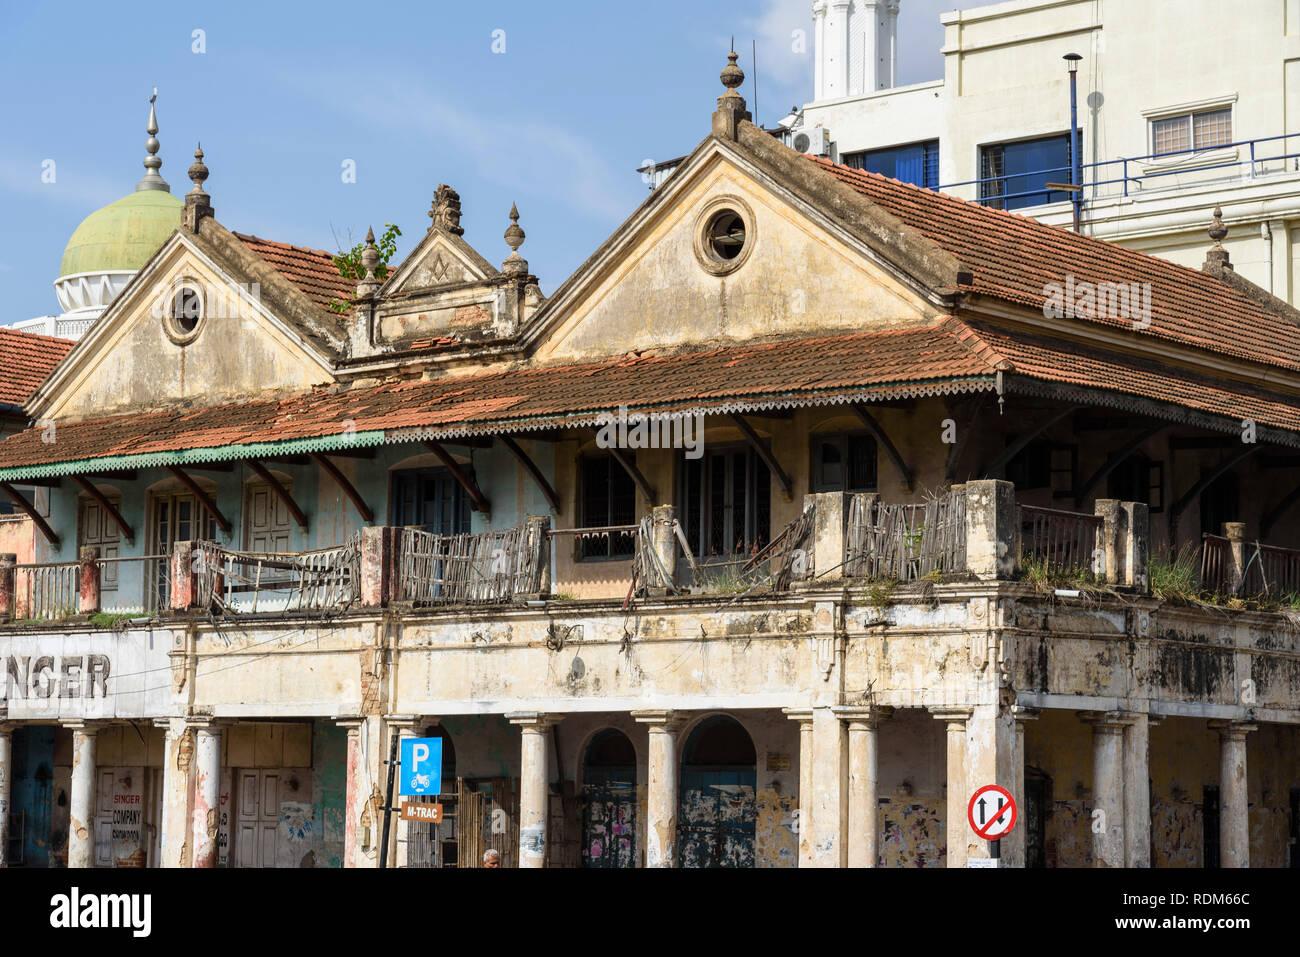 Fading colonia architecture, Mysore, Mysuru, Karnataka, India - Stock Image